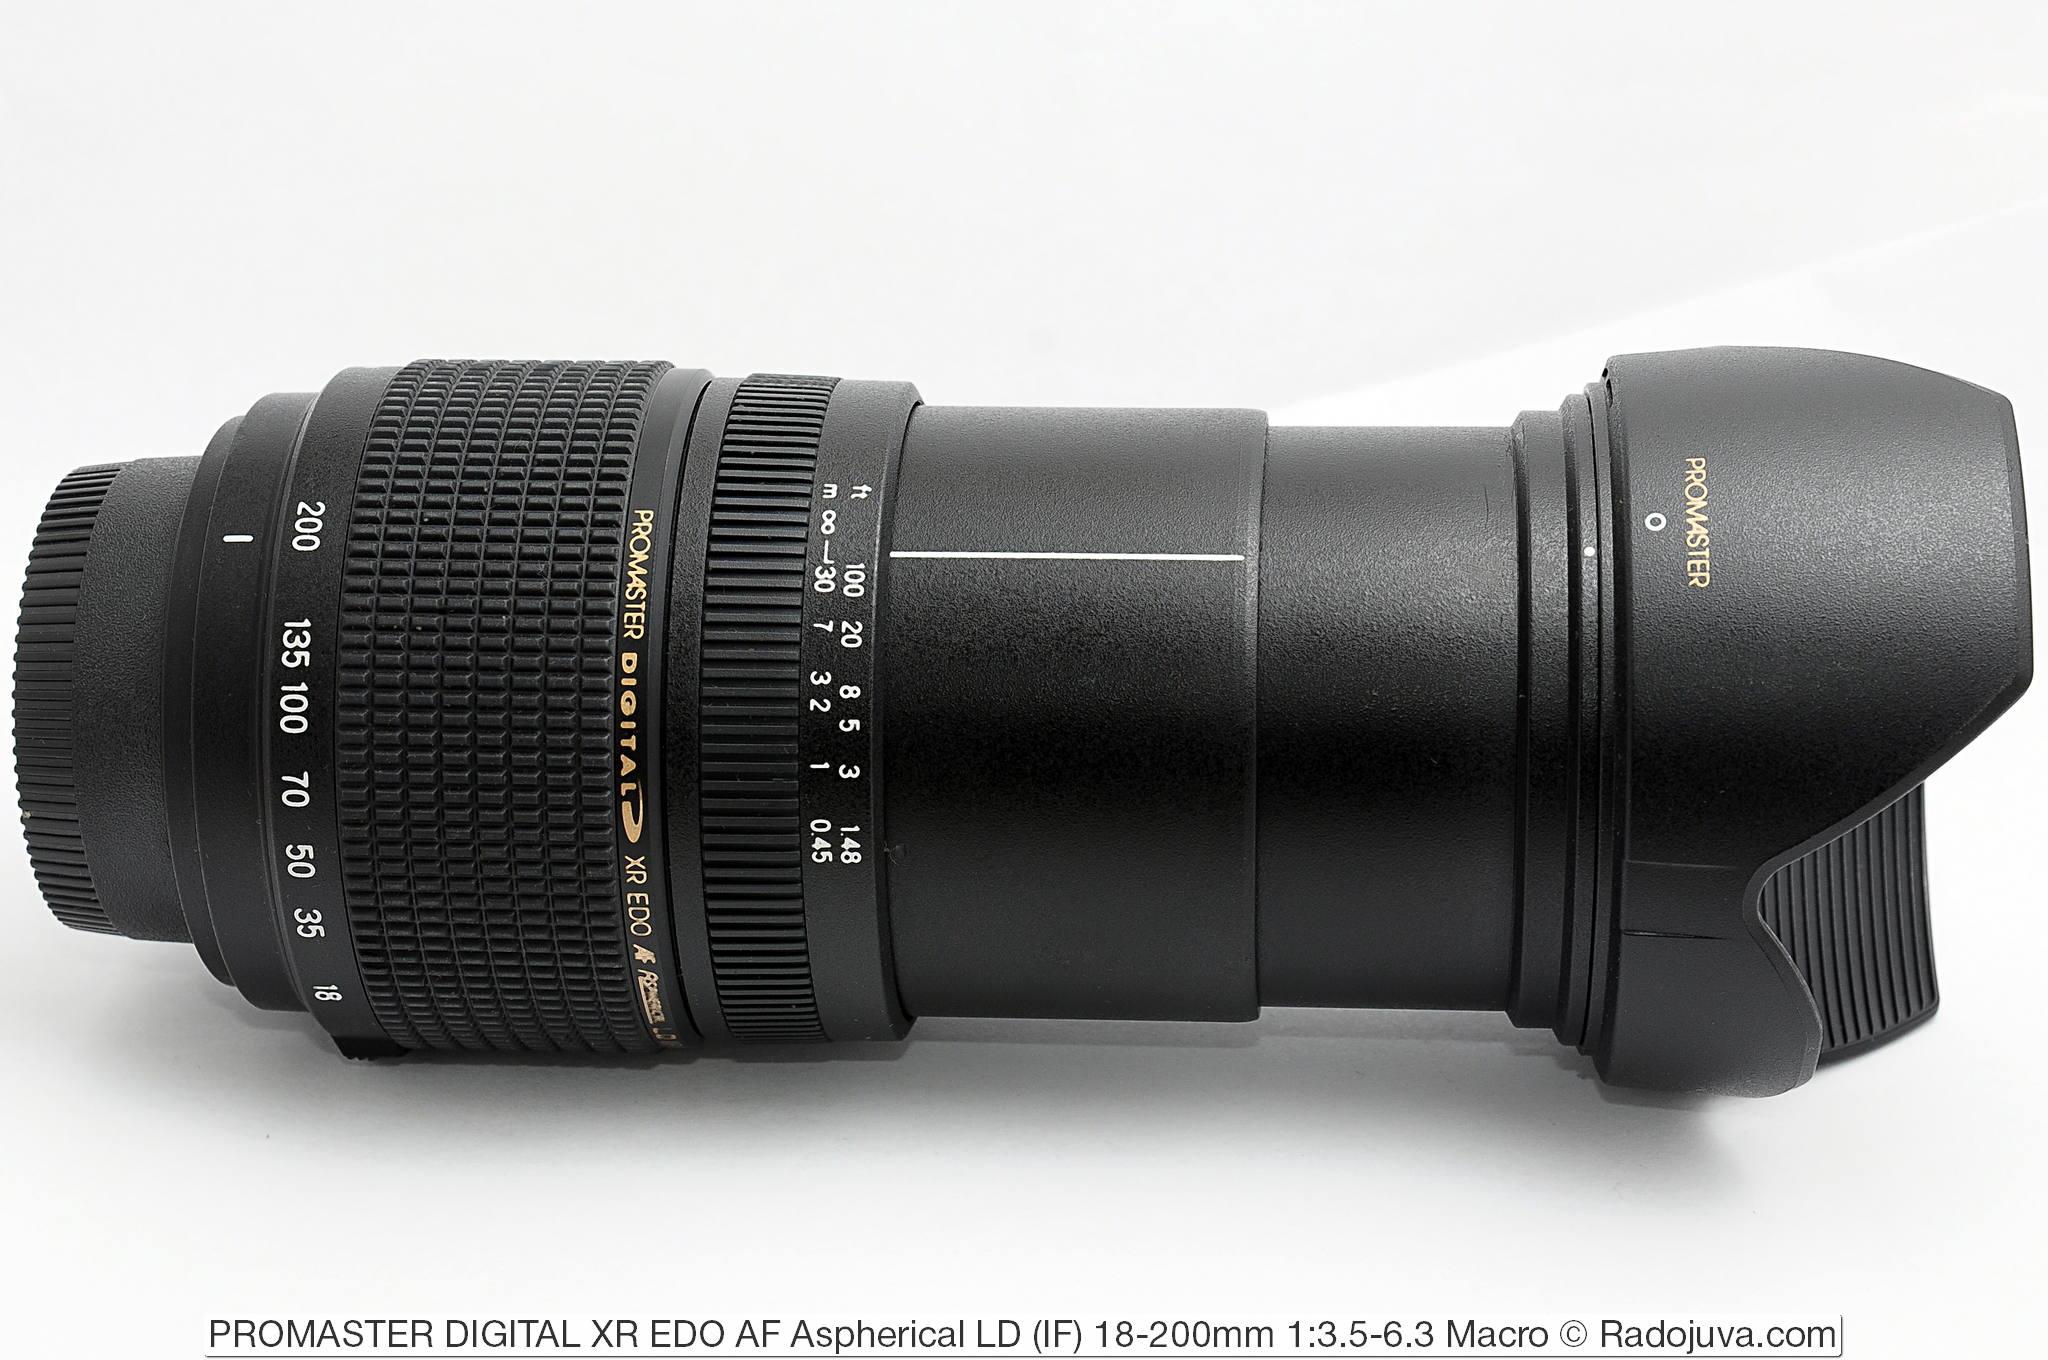 PROMASTER DIGITAL XR EDO AF Aspherical LD (IF) 18-200mm 1:3.5-6.3 Macro